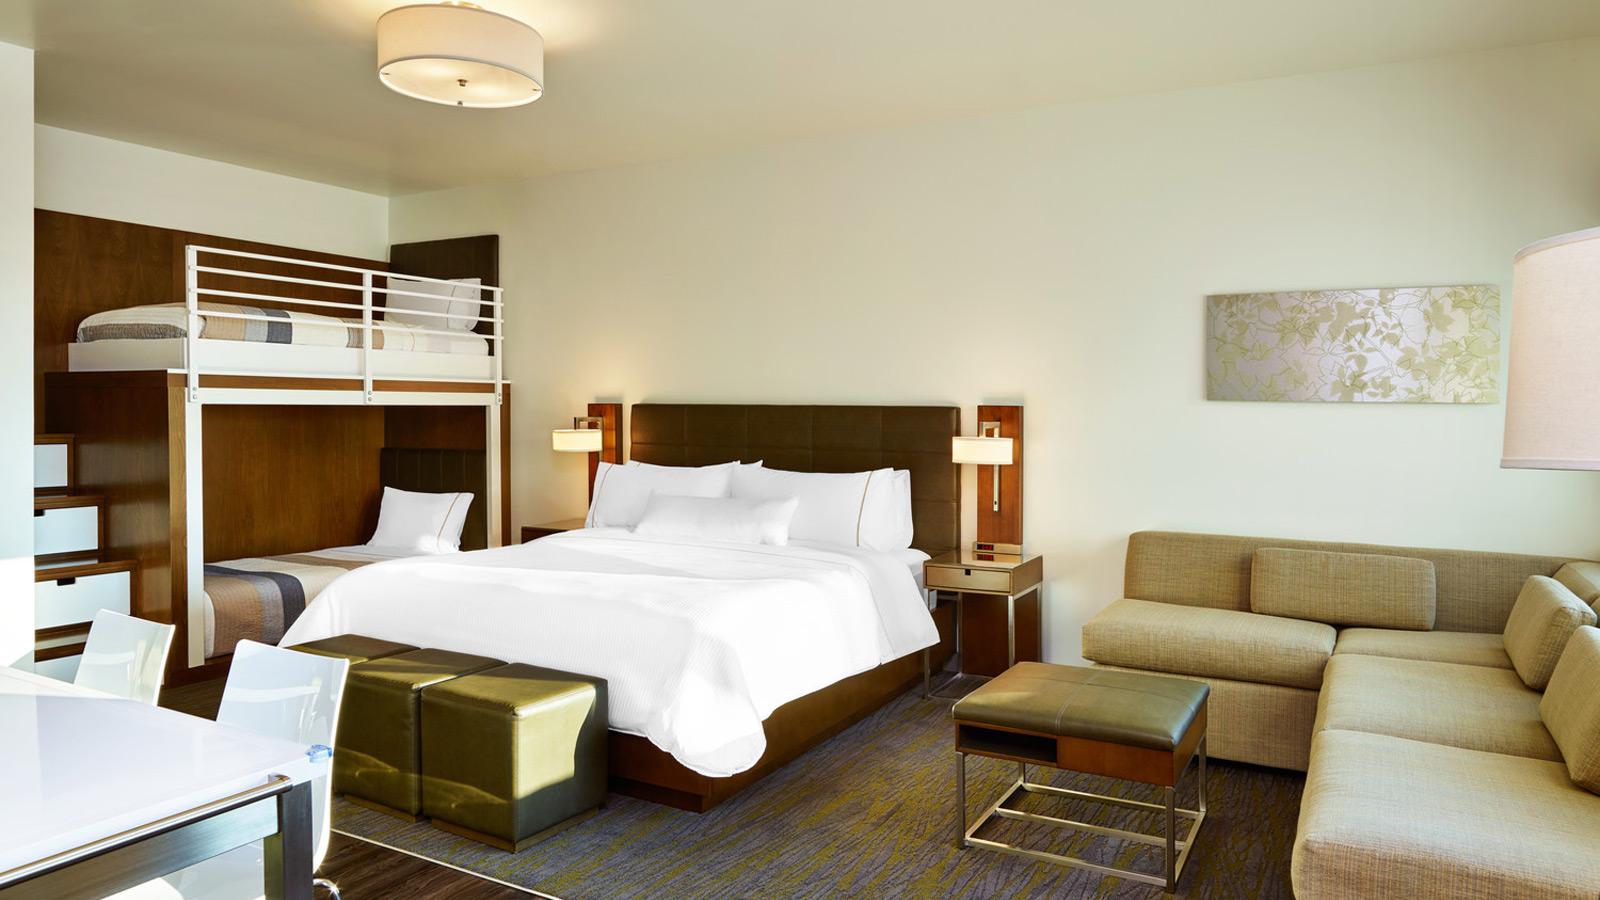 Element Hotel 4.jpg